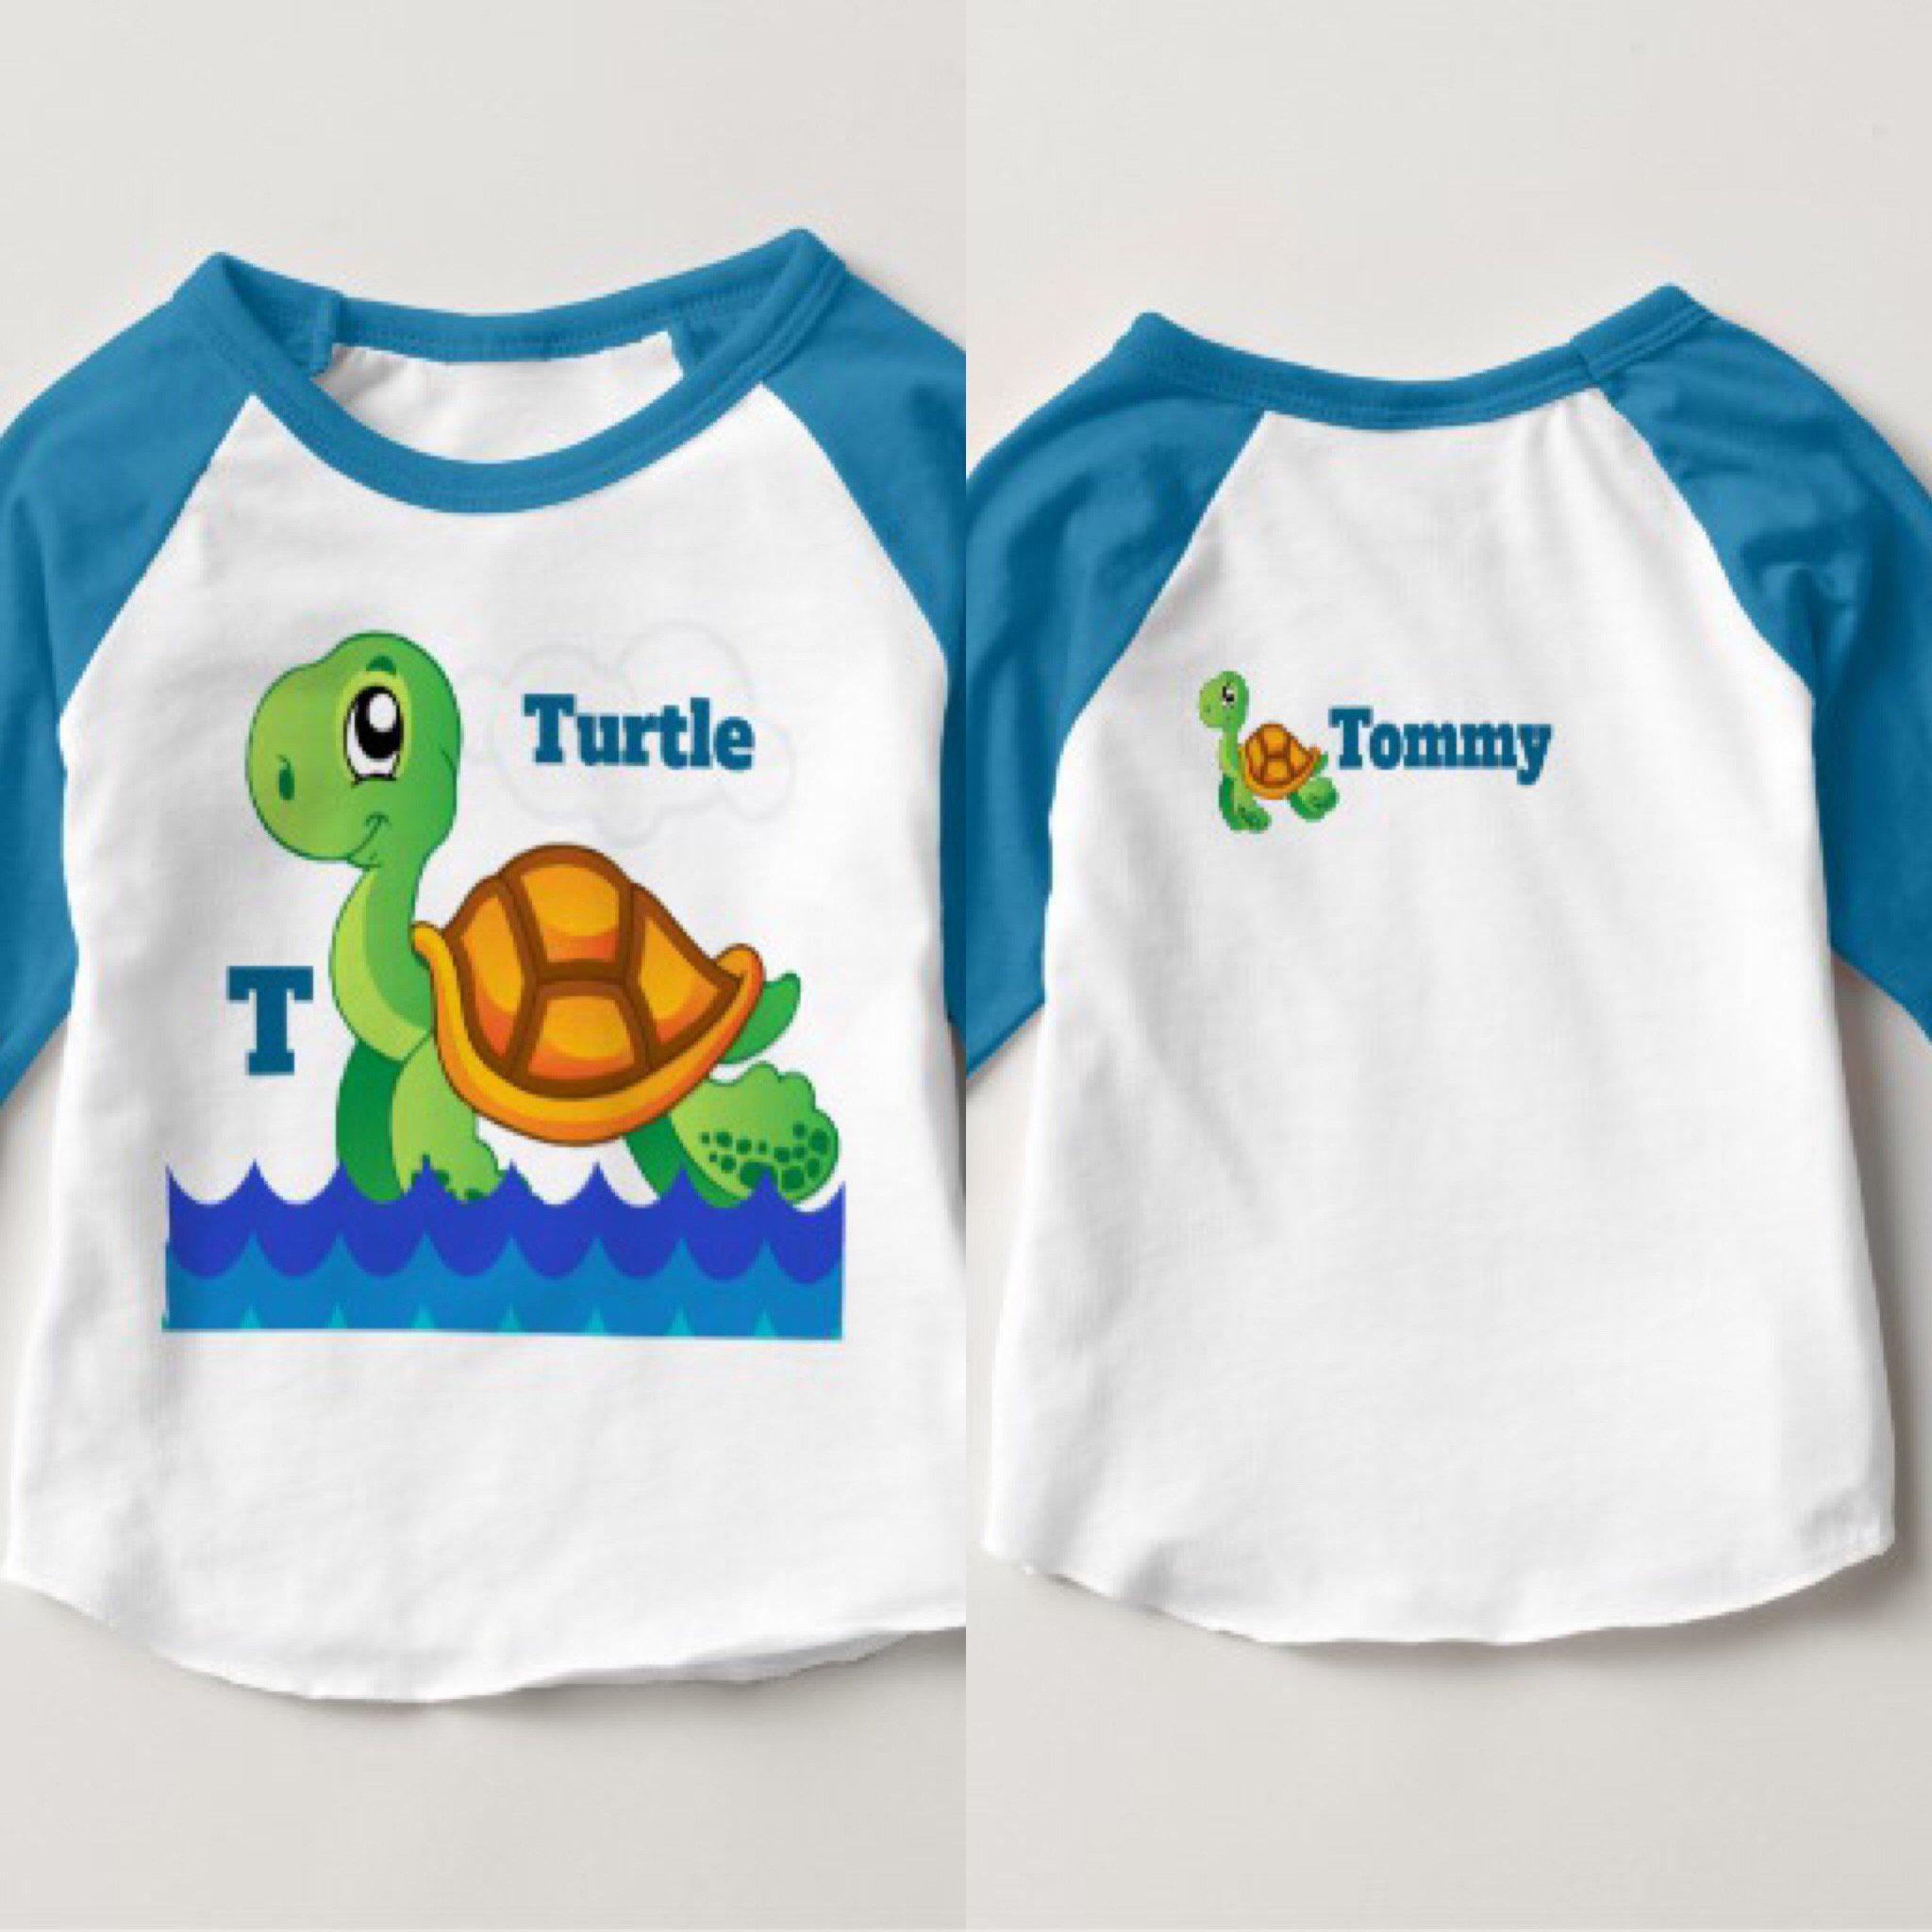 #Alphabet #T For #Turtle #Baby #Raglan #T-Shirt #Anerica #Apparel #Gift #Clothes  https://t.co/0DfOn6kCp7 https://t.co/UZWUaijNIA